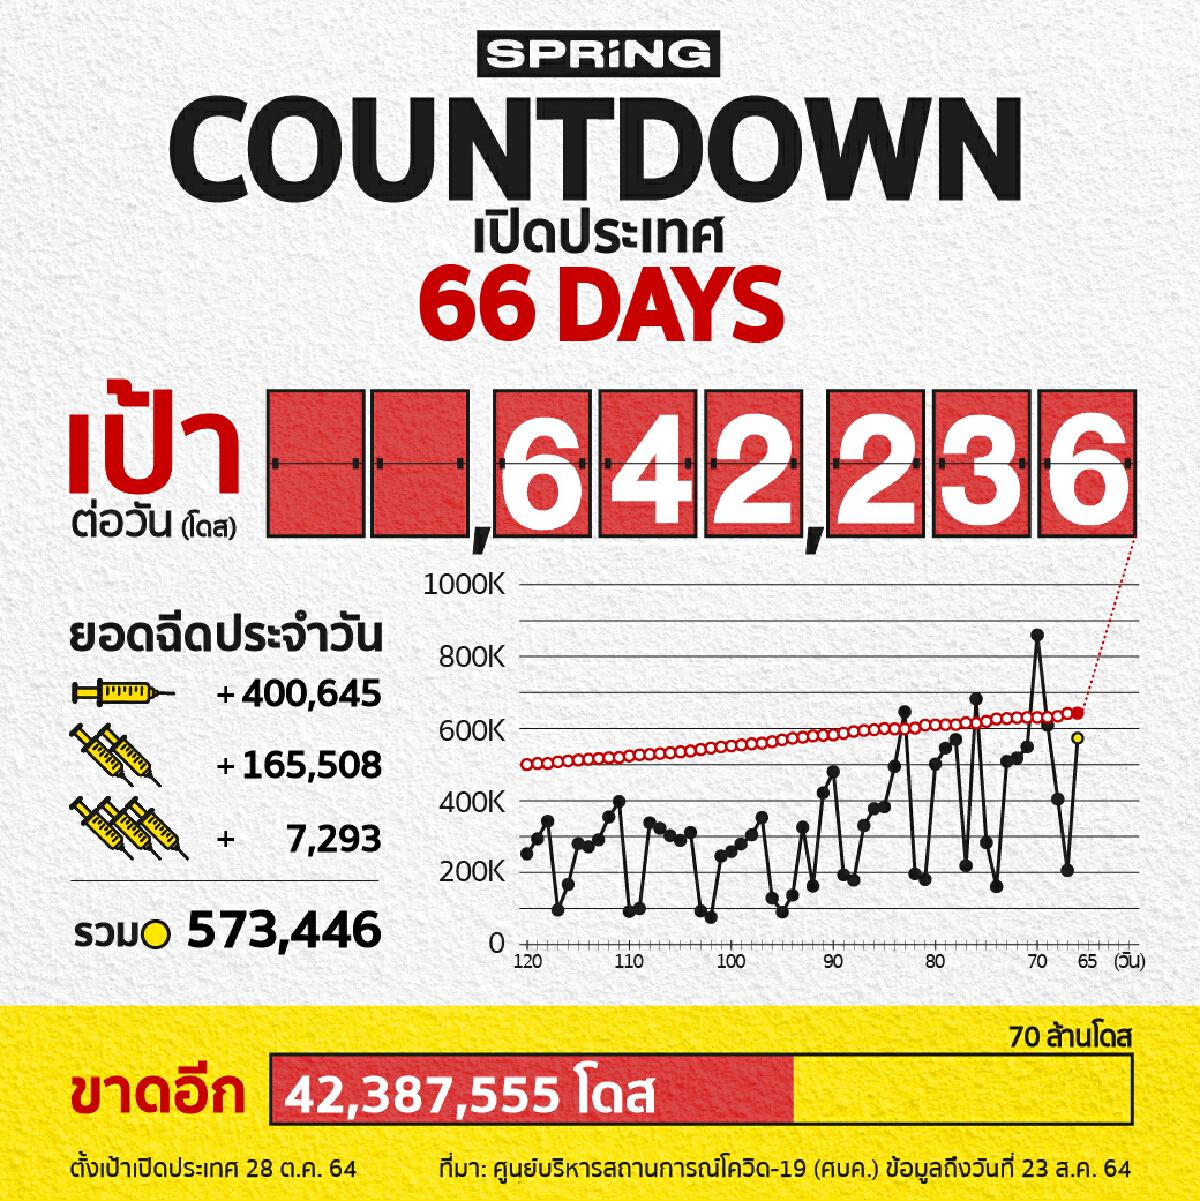 COUNTDOWN! เปิดประเทศใน 66 วัน ฉีดวัคซีนโควิด 573,446 โดส